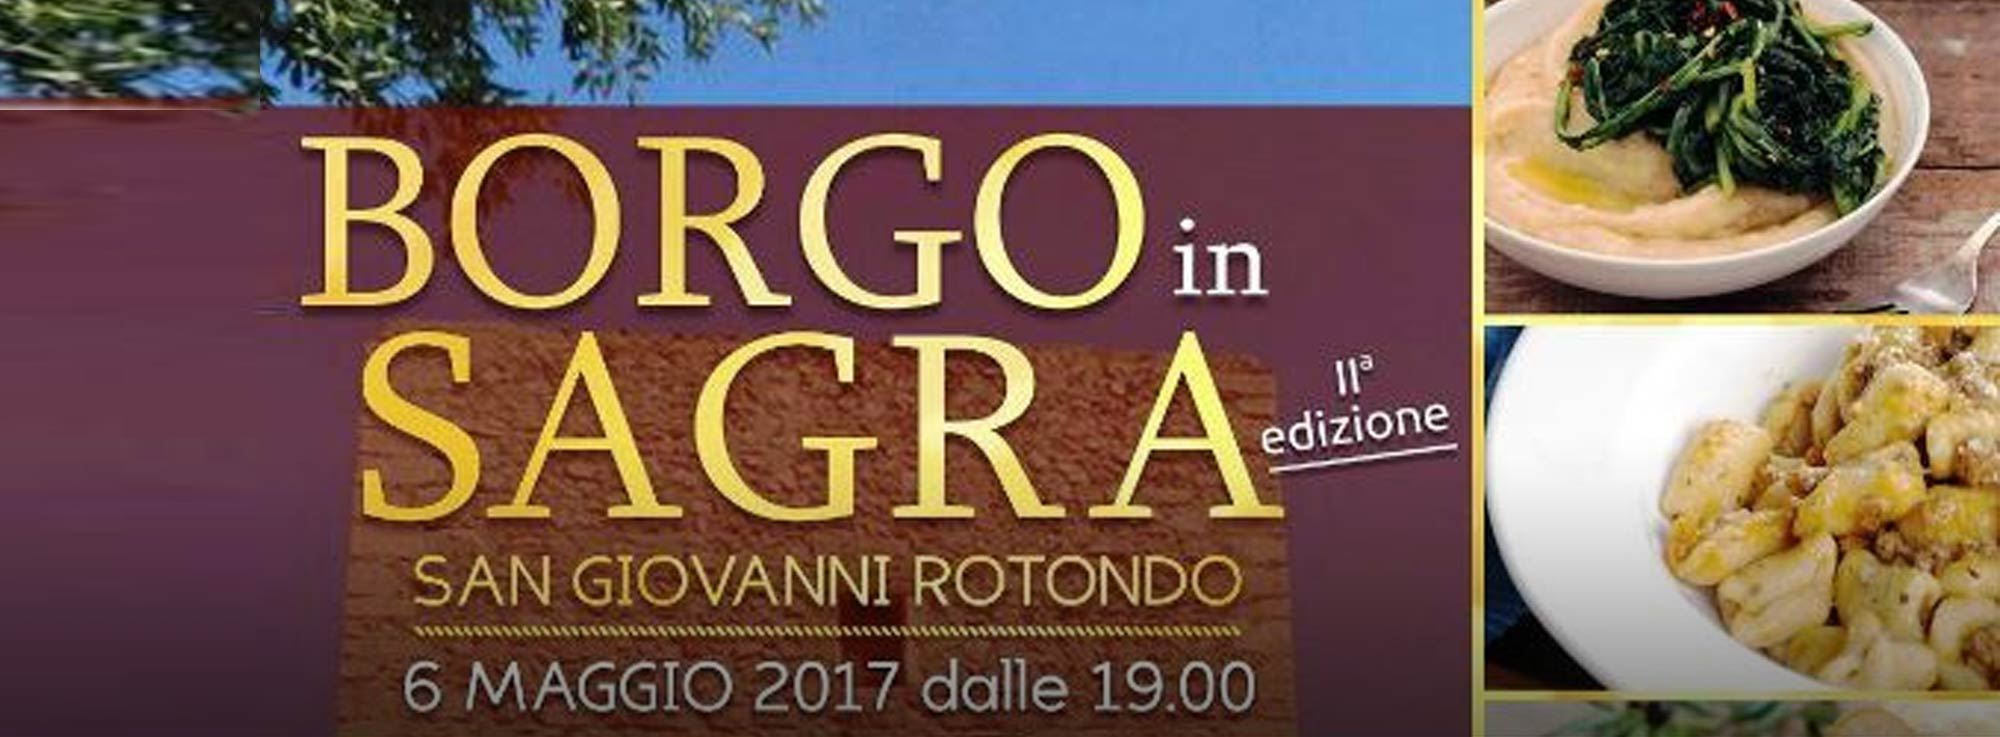 San Giovanni Rotondo: Borgo in Sagra